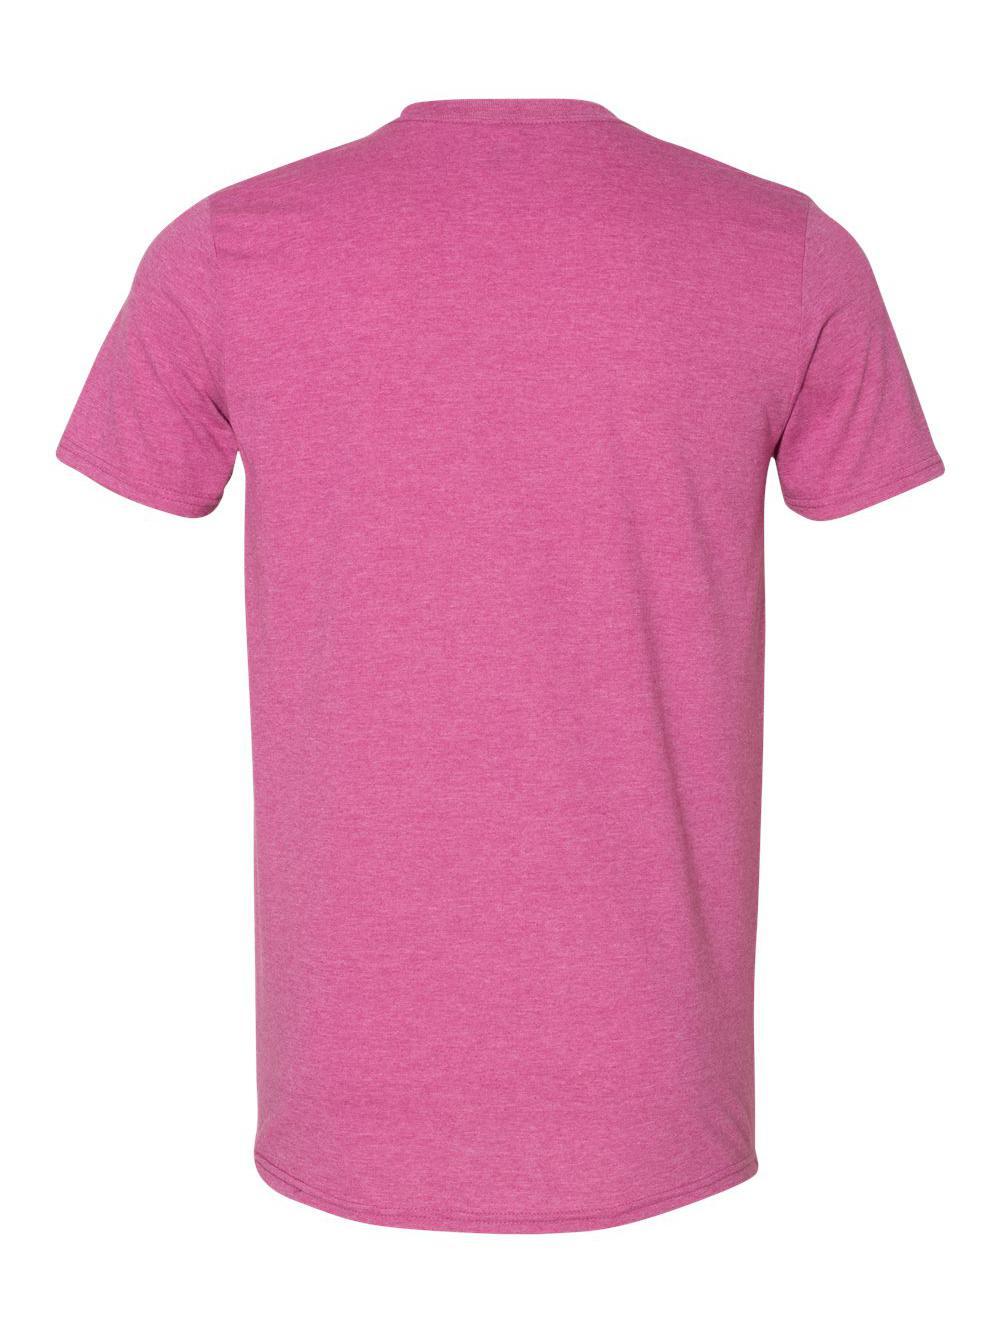 Gildan-Softstyle-T-Shirt-64000 thumbnail 55